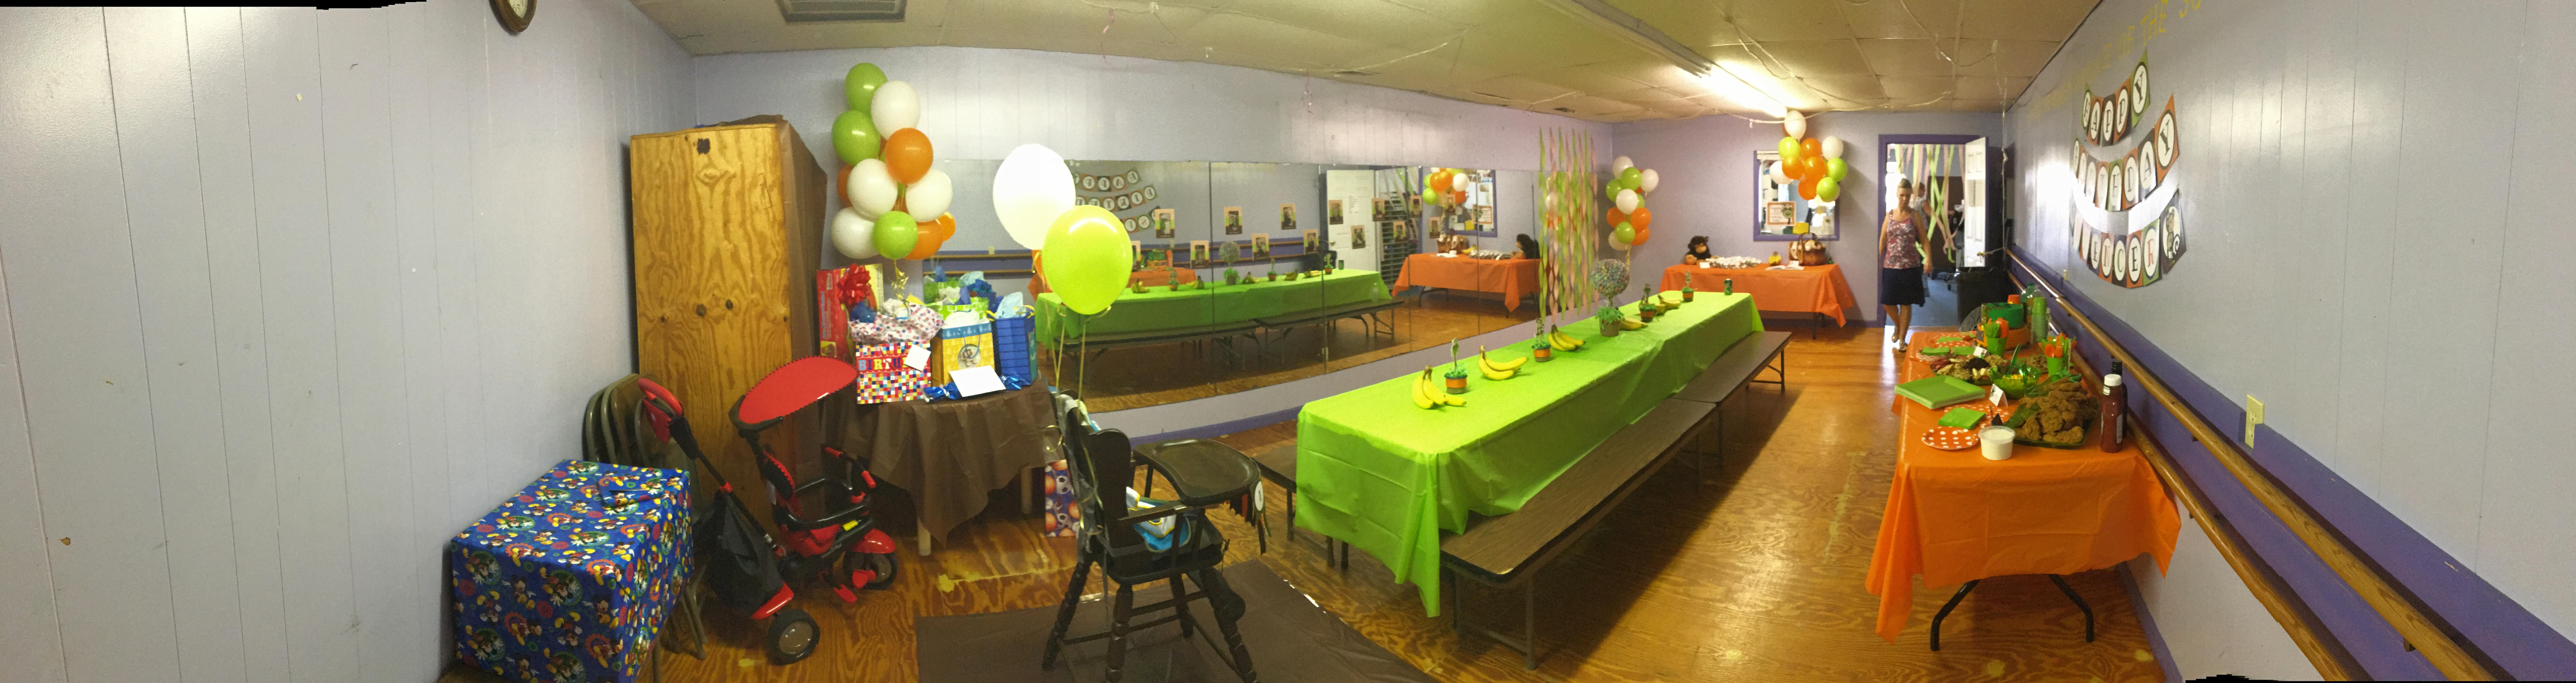 tumblegym birthday parties 2